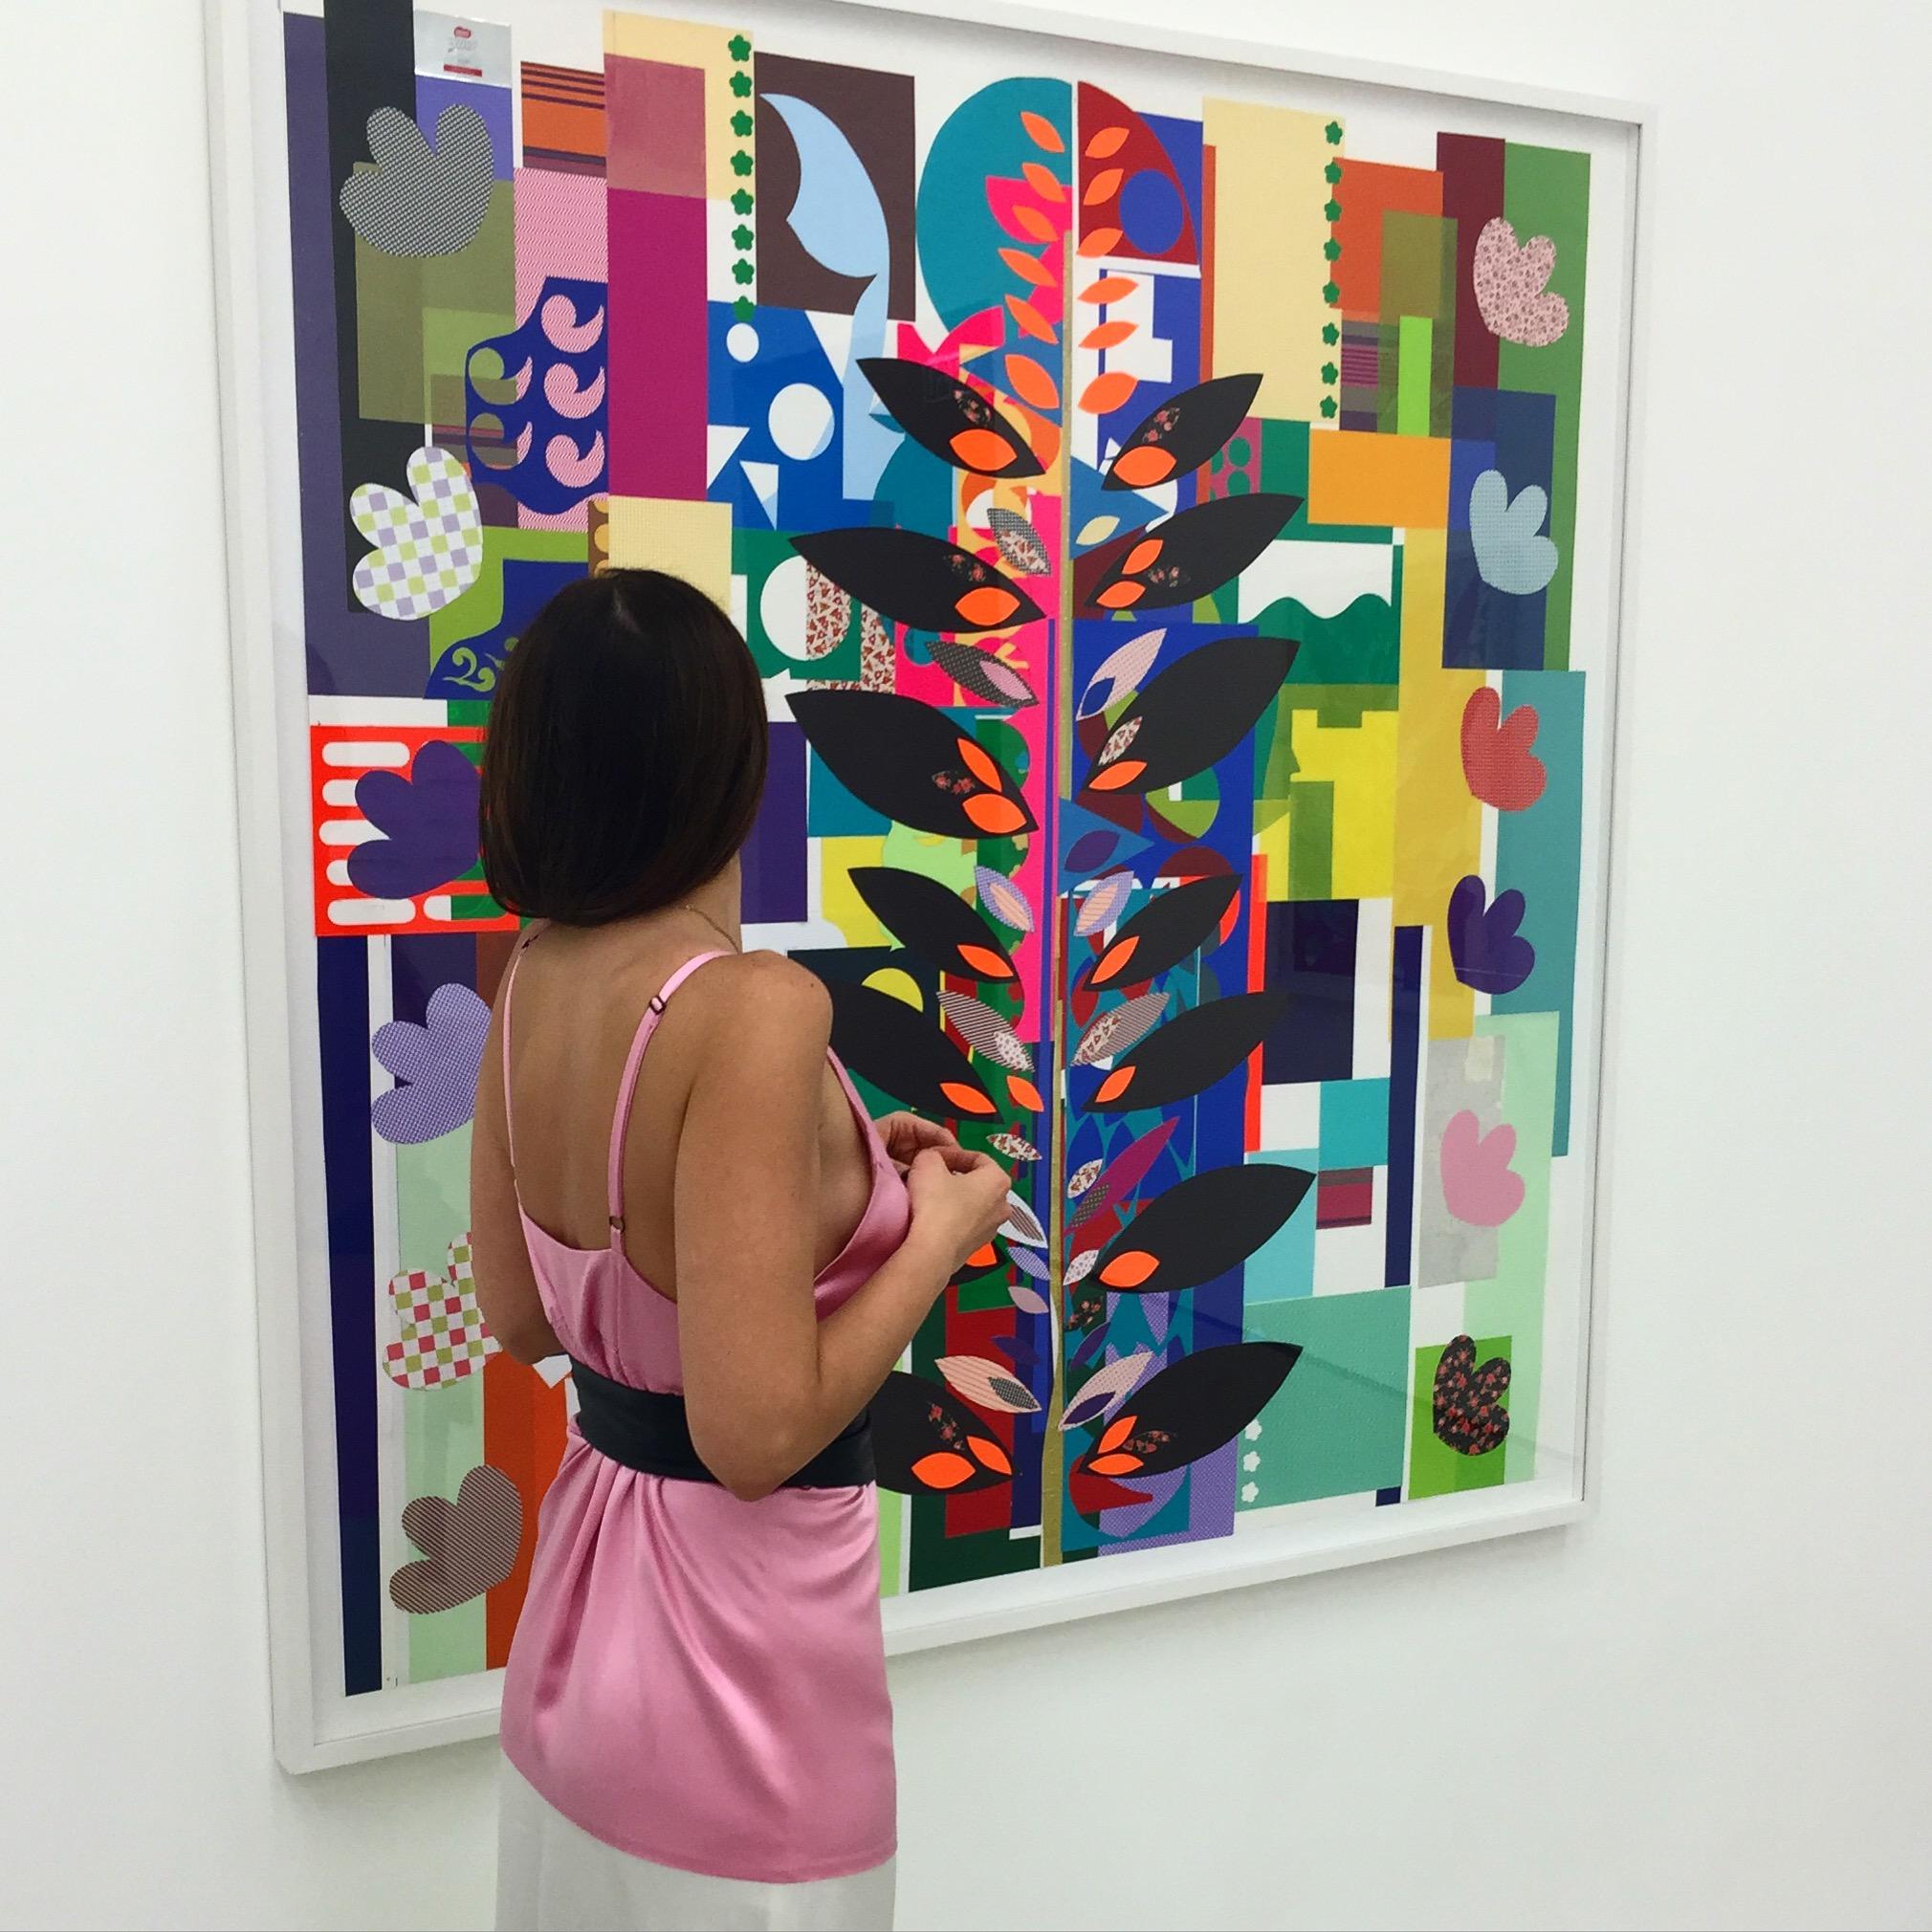 Beatriz Milhazes at White Cube